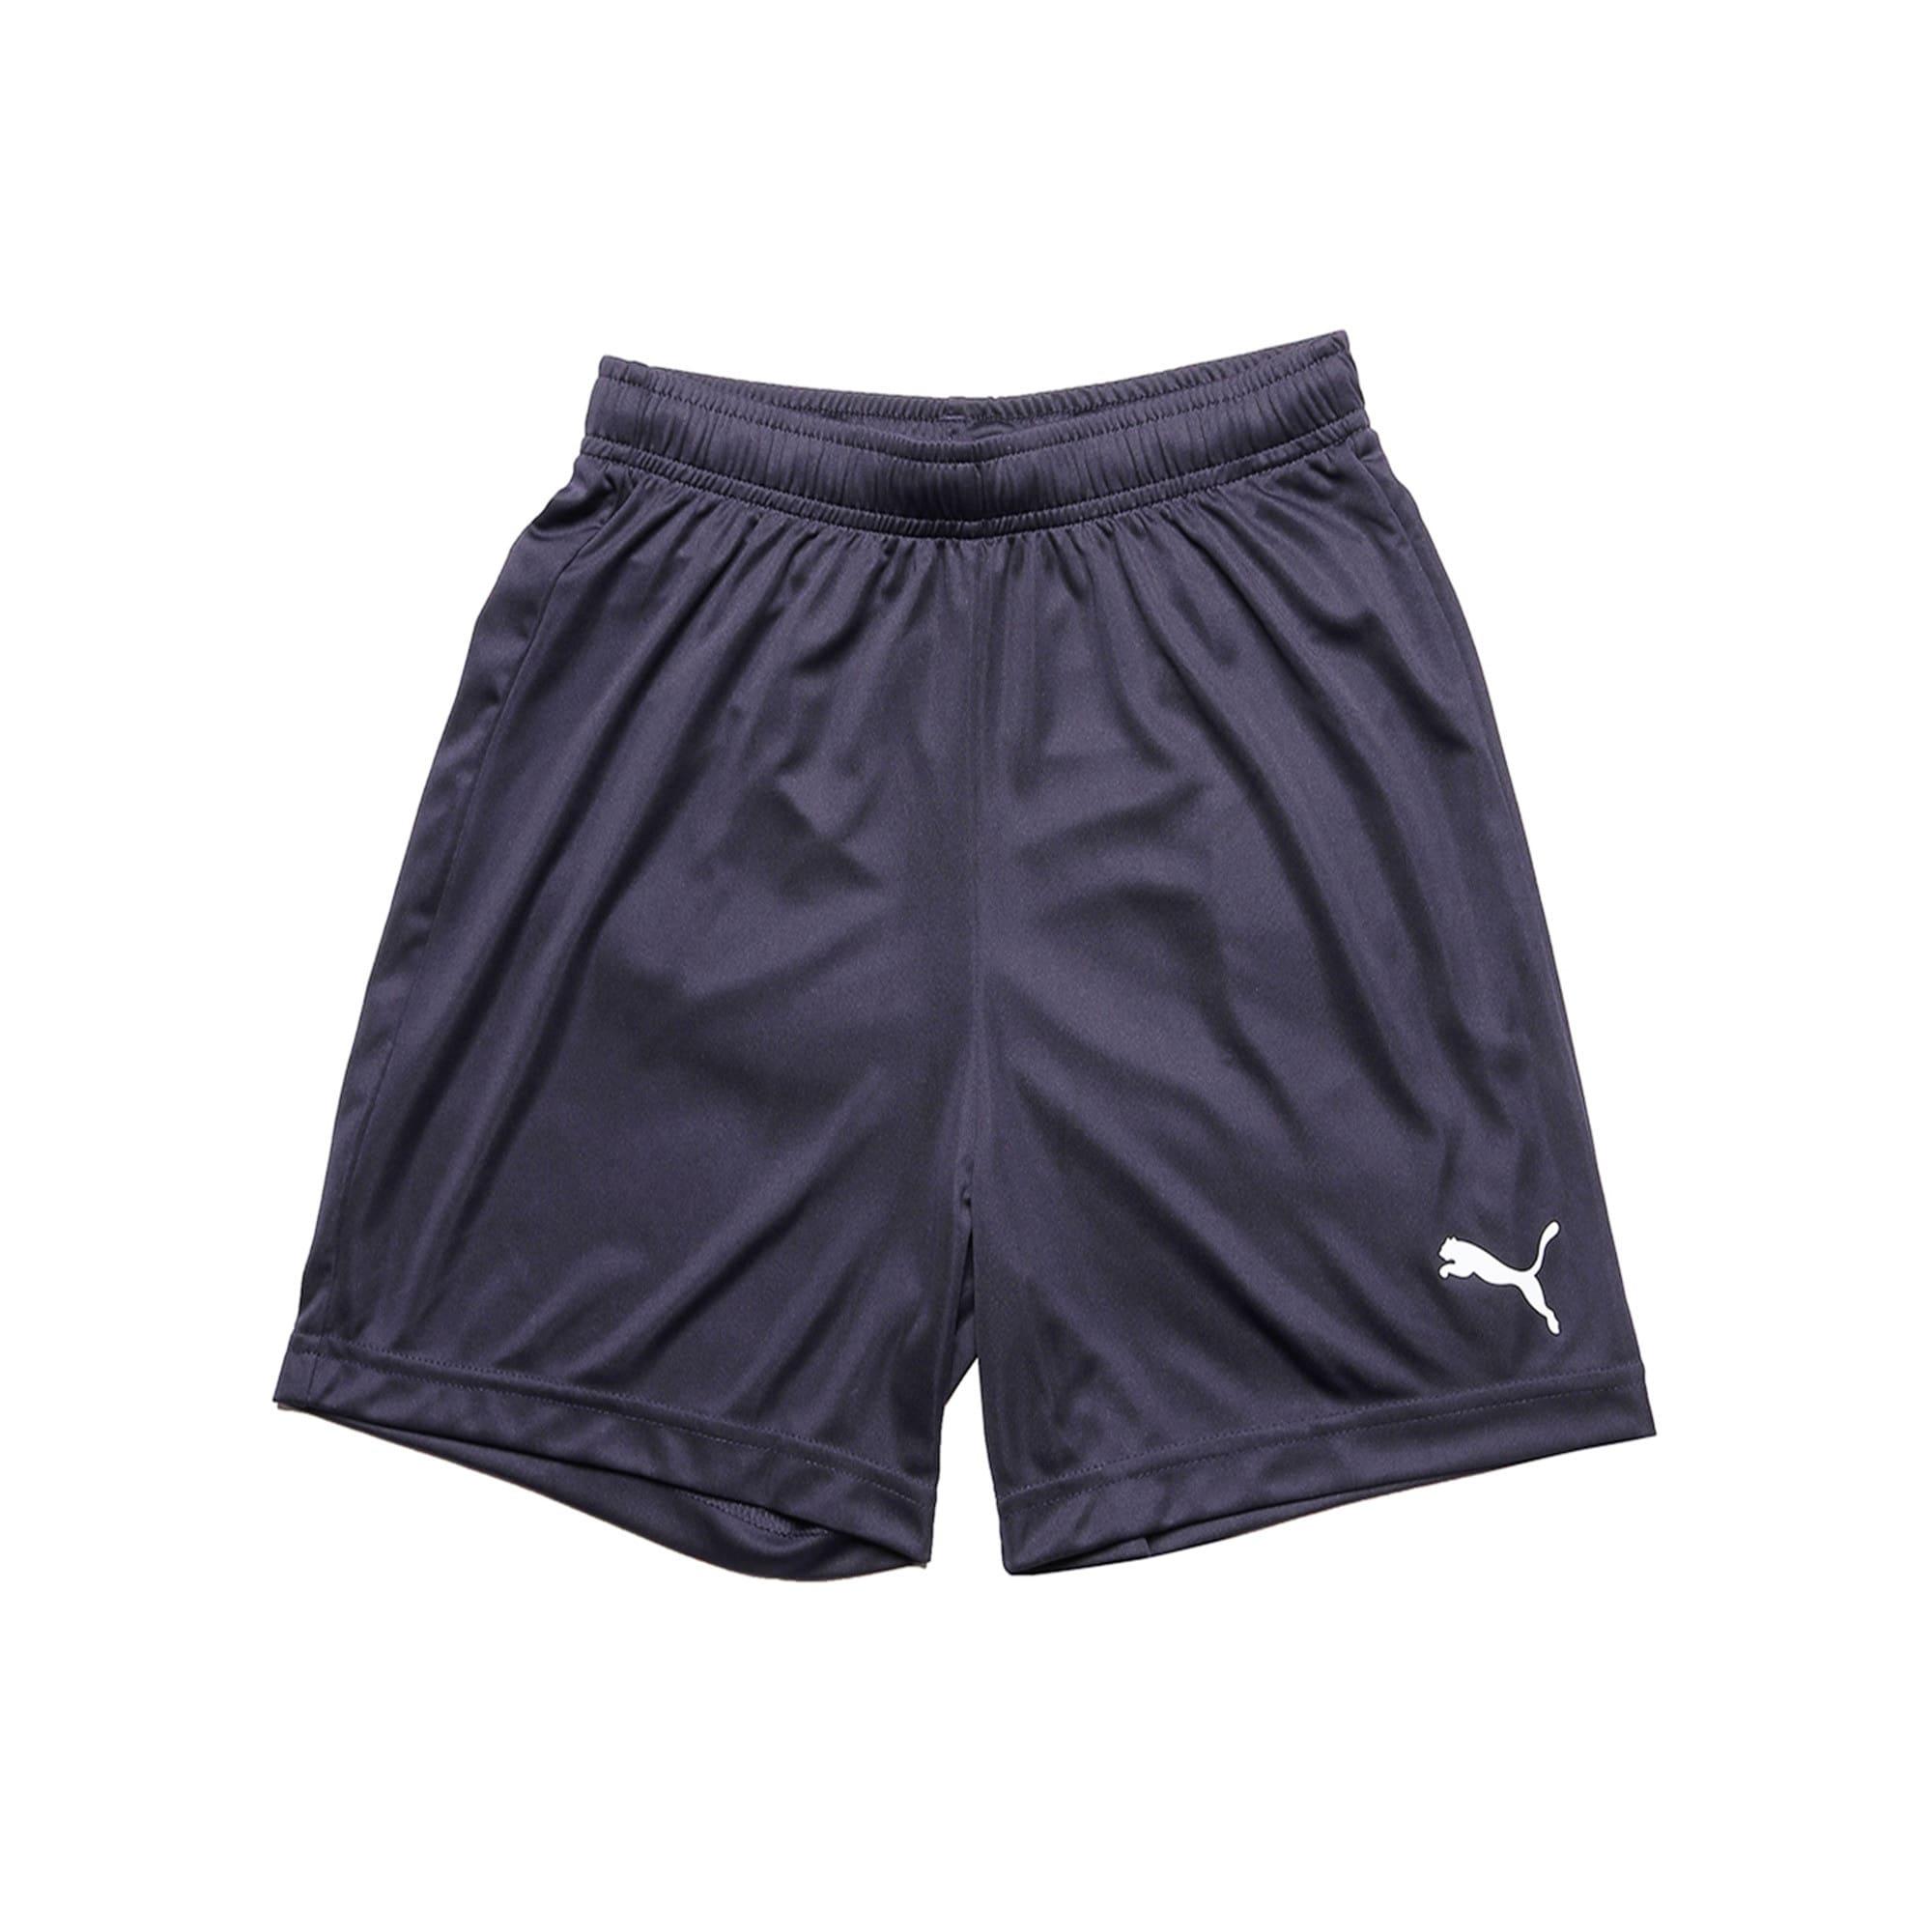 Thumbnail 2 of ftblPLAY Kids' Shorts, Puma New Navy, medium-IND